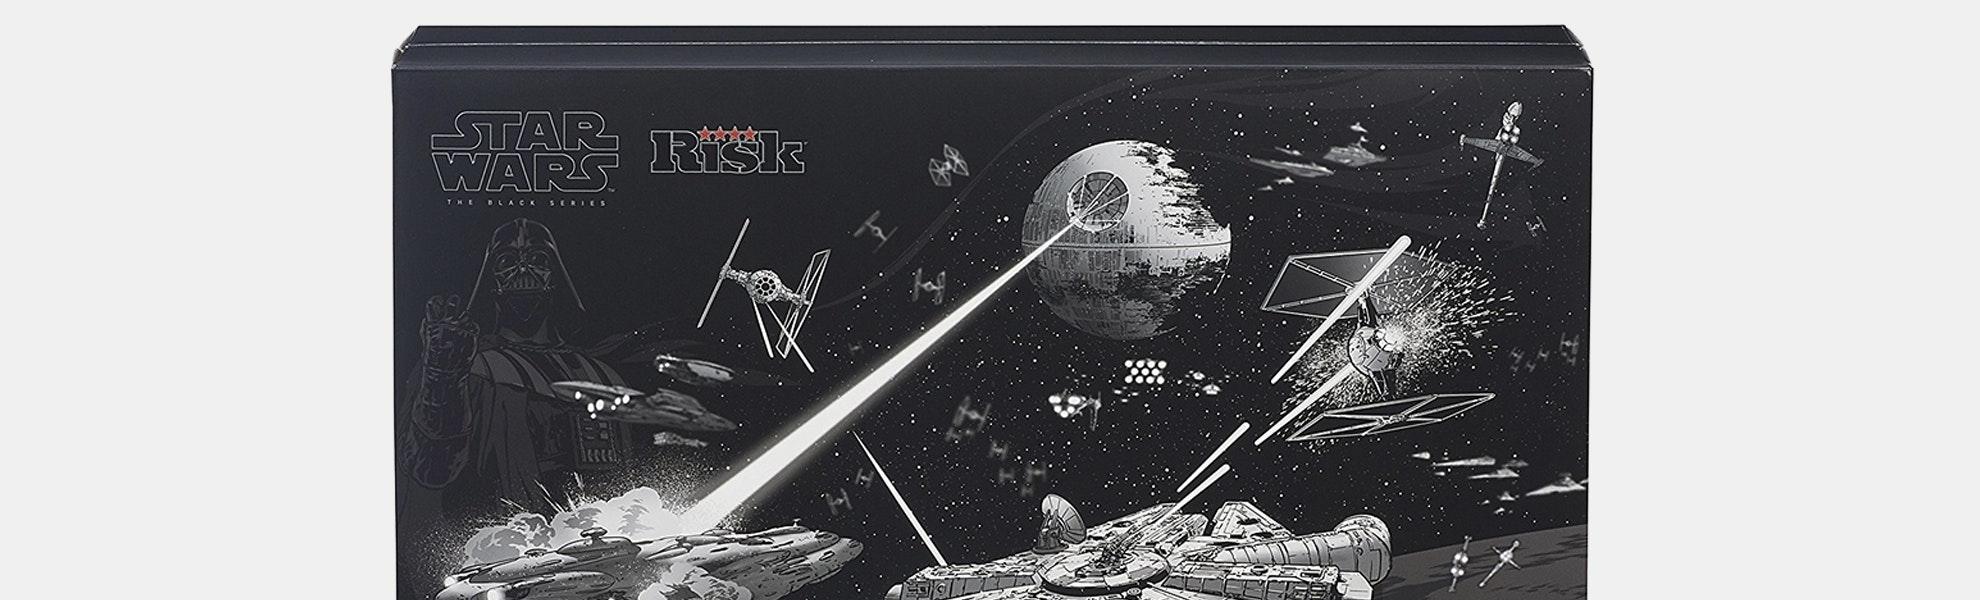 Star Wars: The Black Series Risk